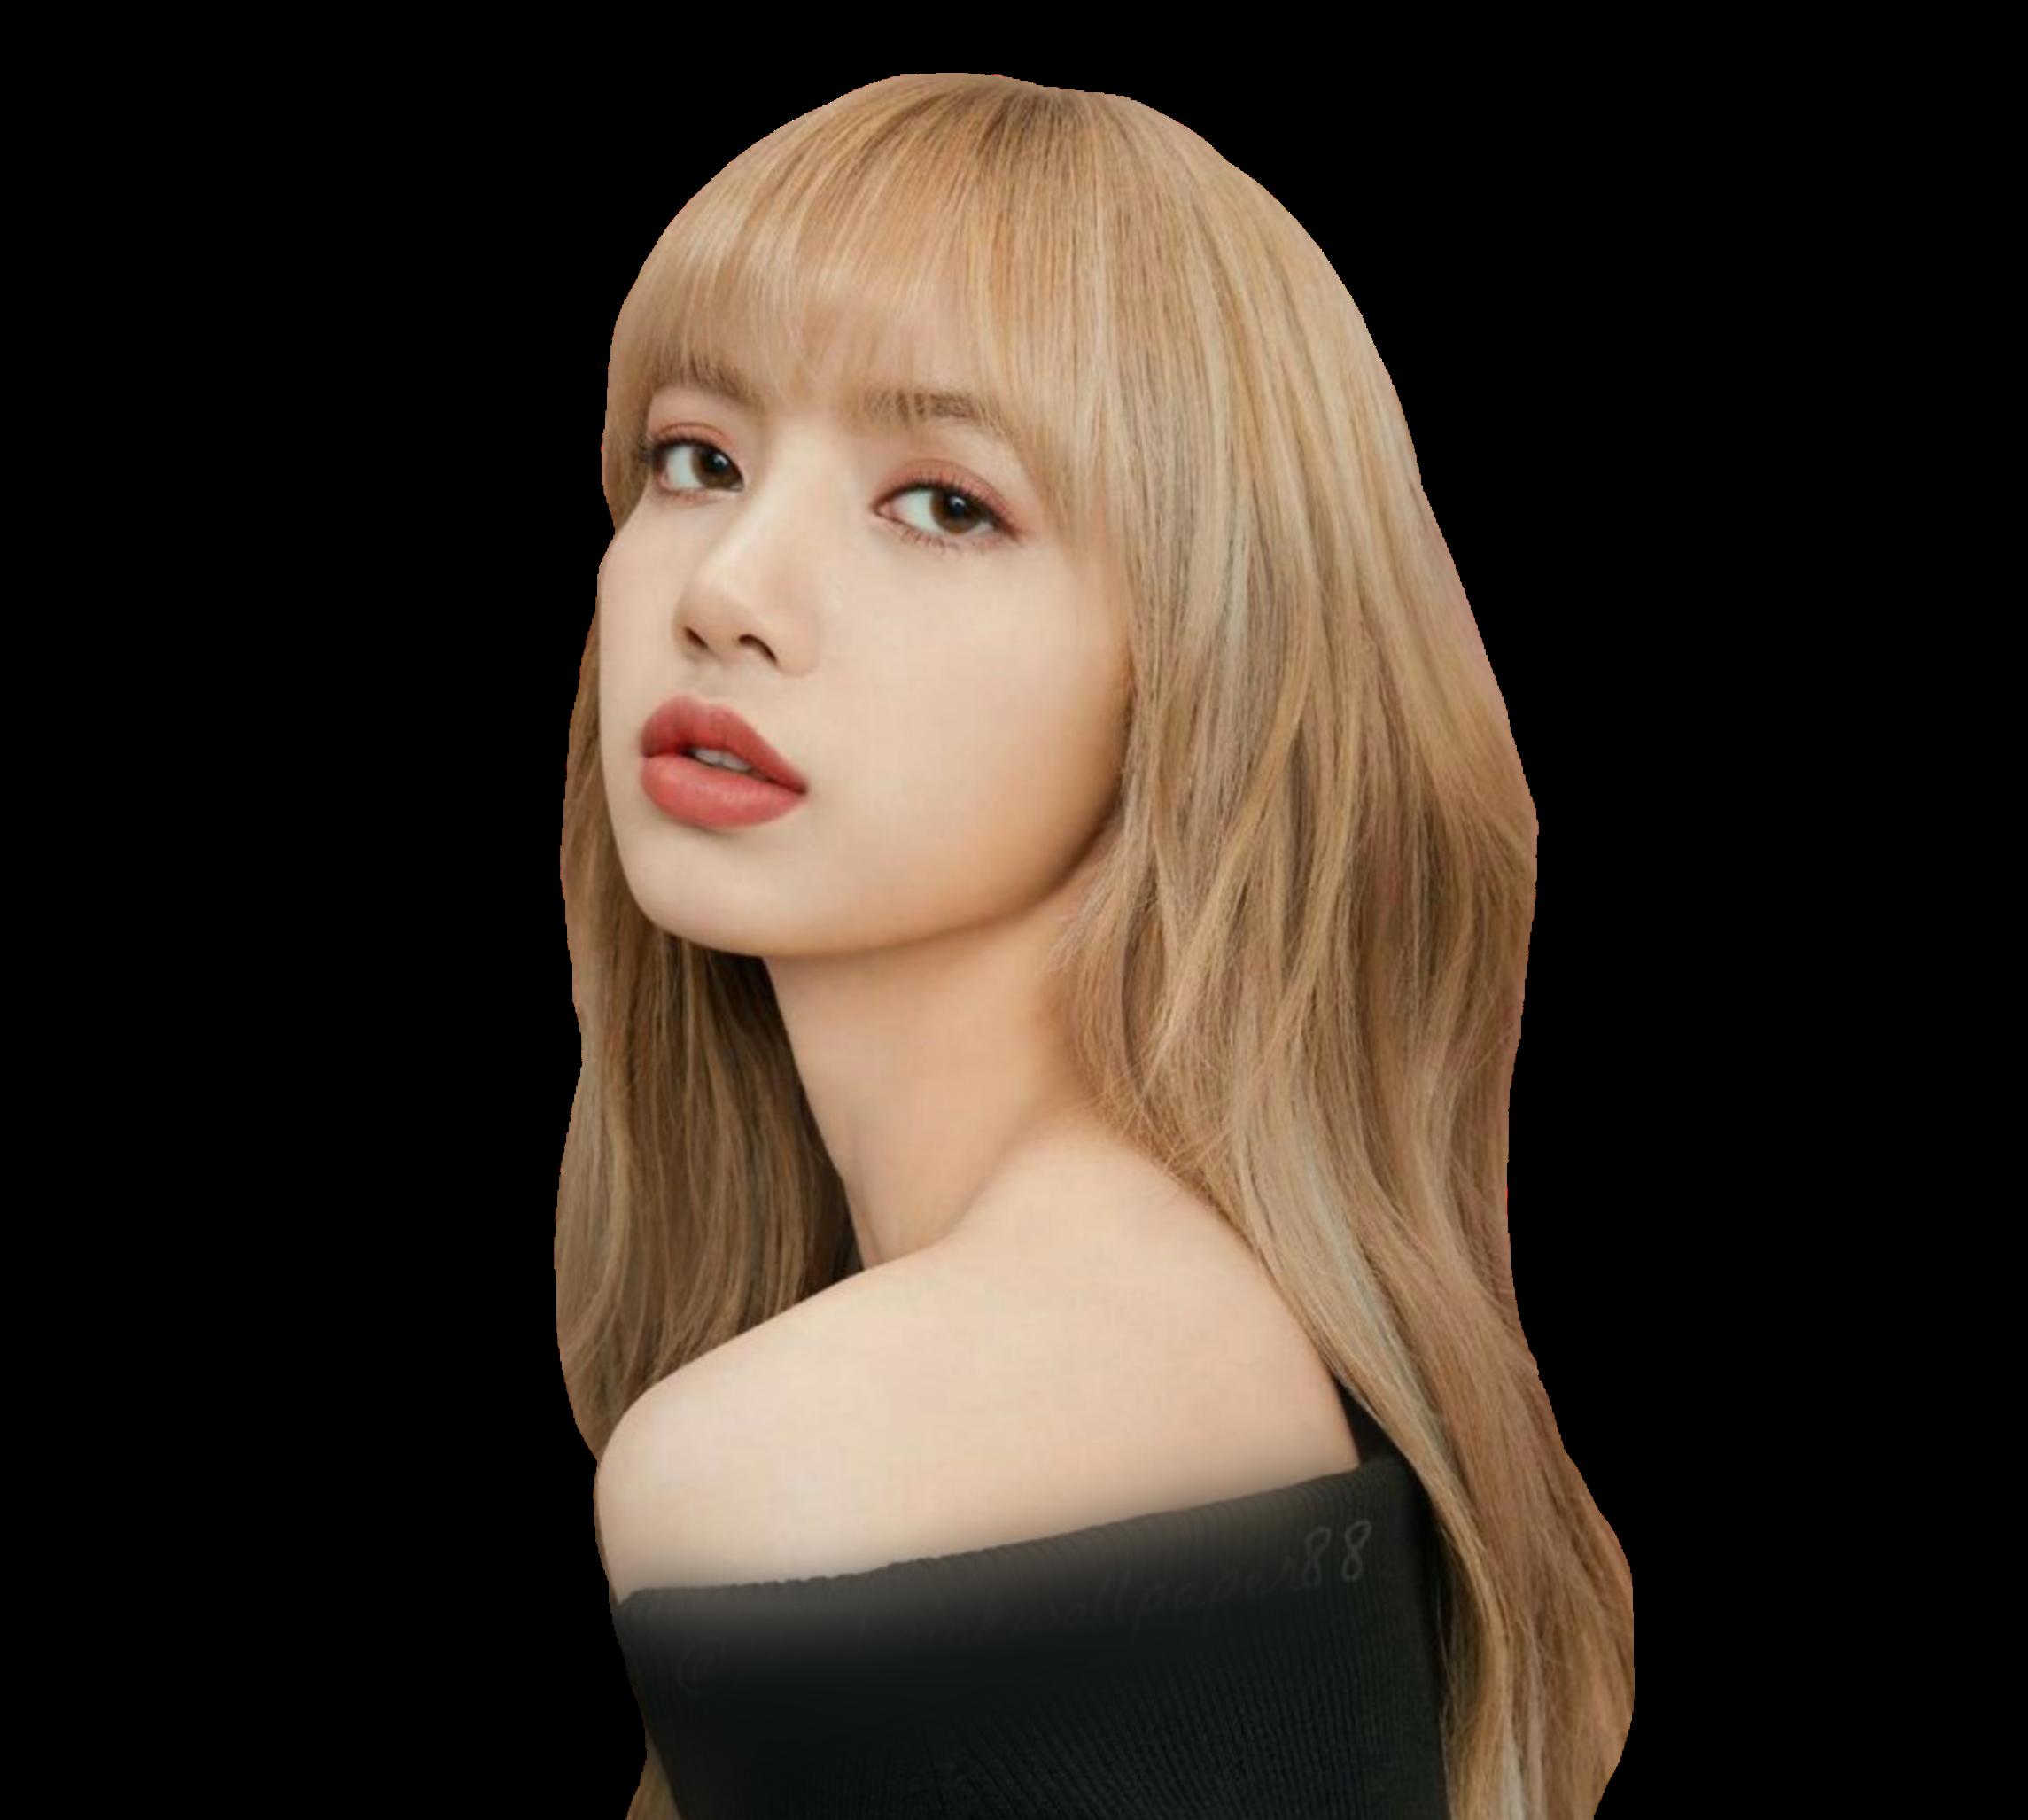 Freetoedit Sticker No Remix Solo Utilizar Blackpink Kpop Bts Geometrickpop Kpopedit Kpopidol Kpopwallpaper Kpoplover Kpop Idol Picsart Bts